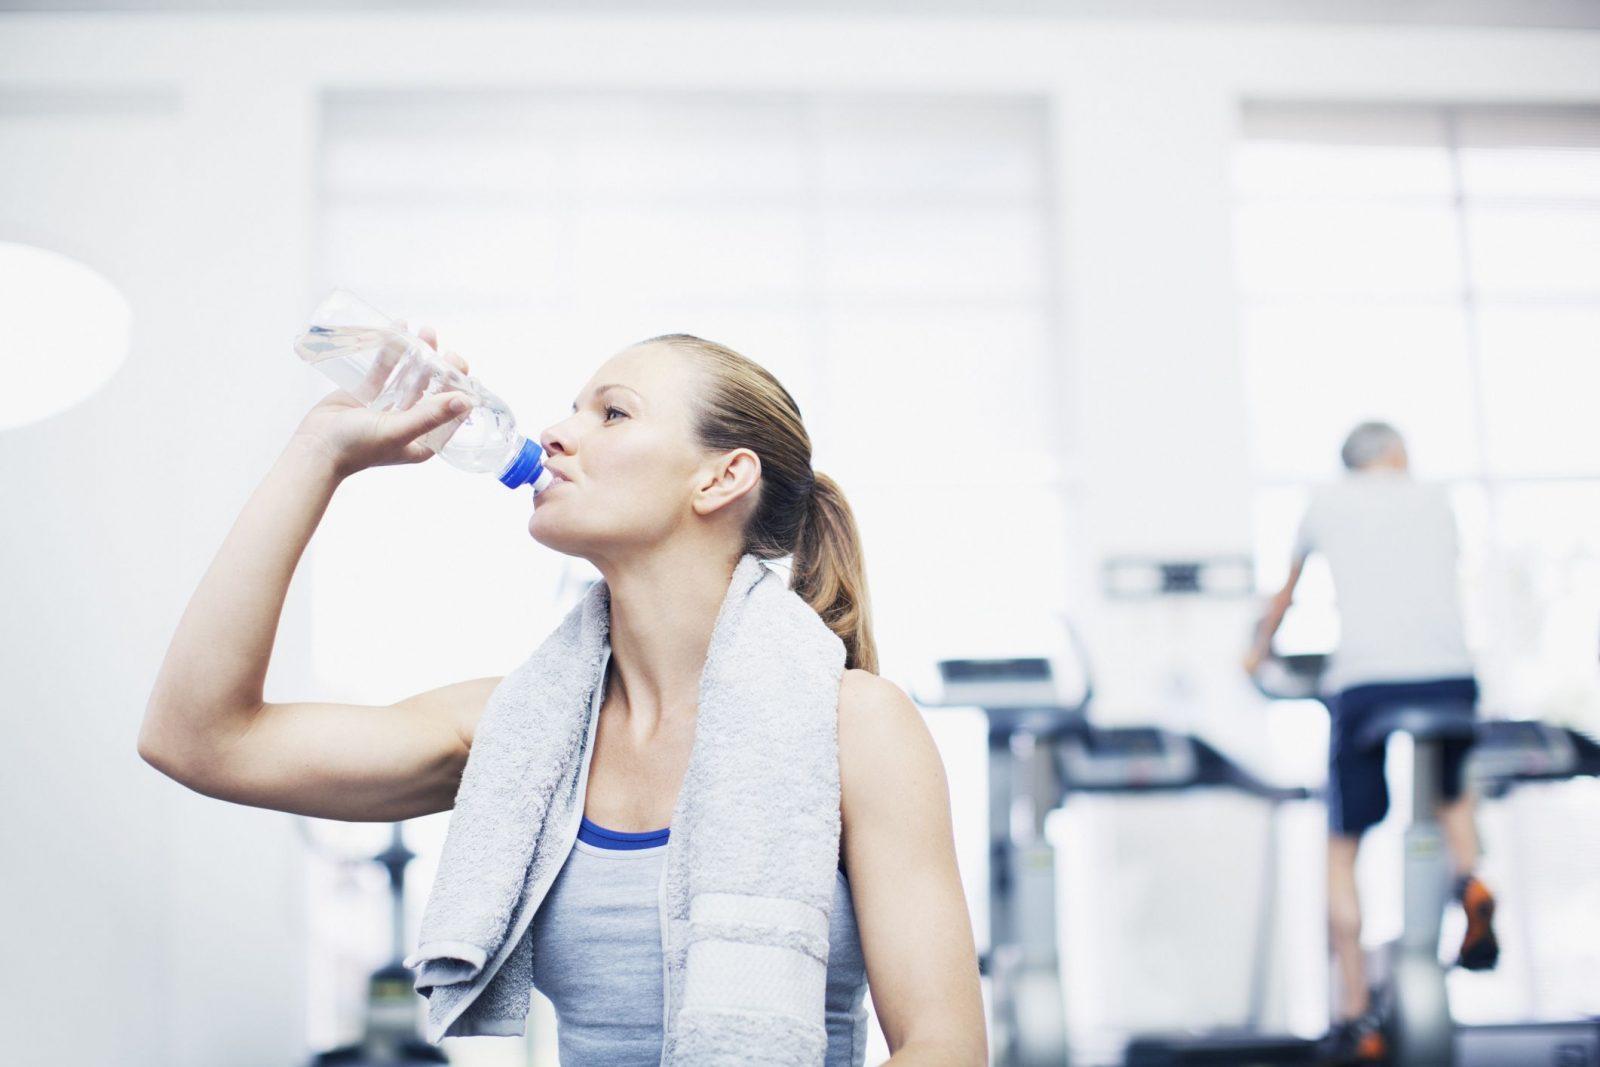 Девушка с полотенцем на шеи пьет воду в тренажерном зале